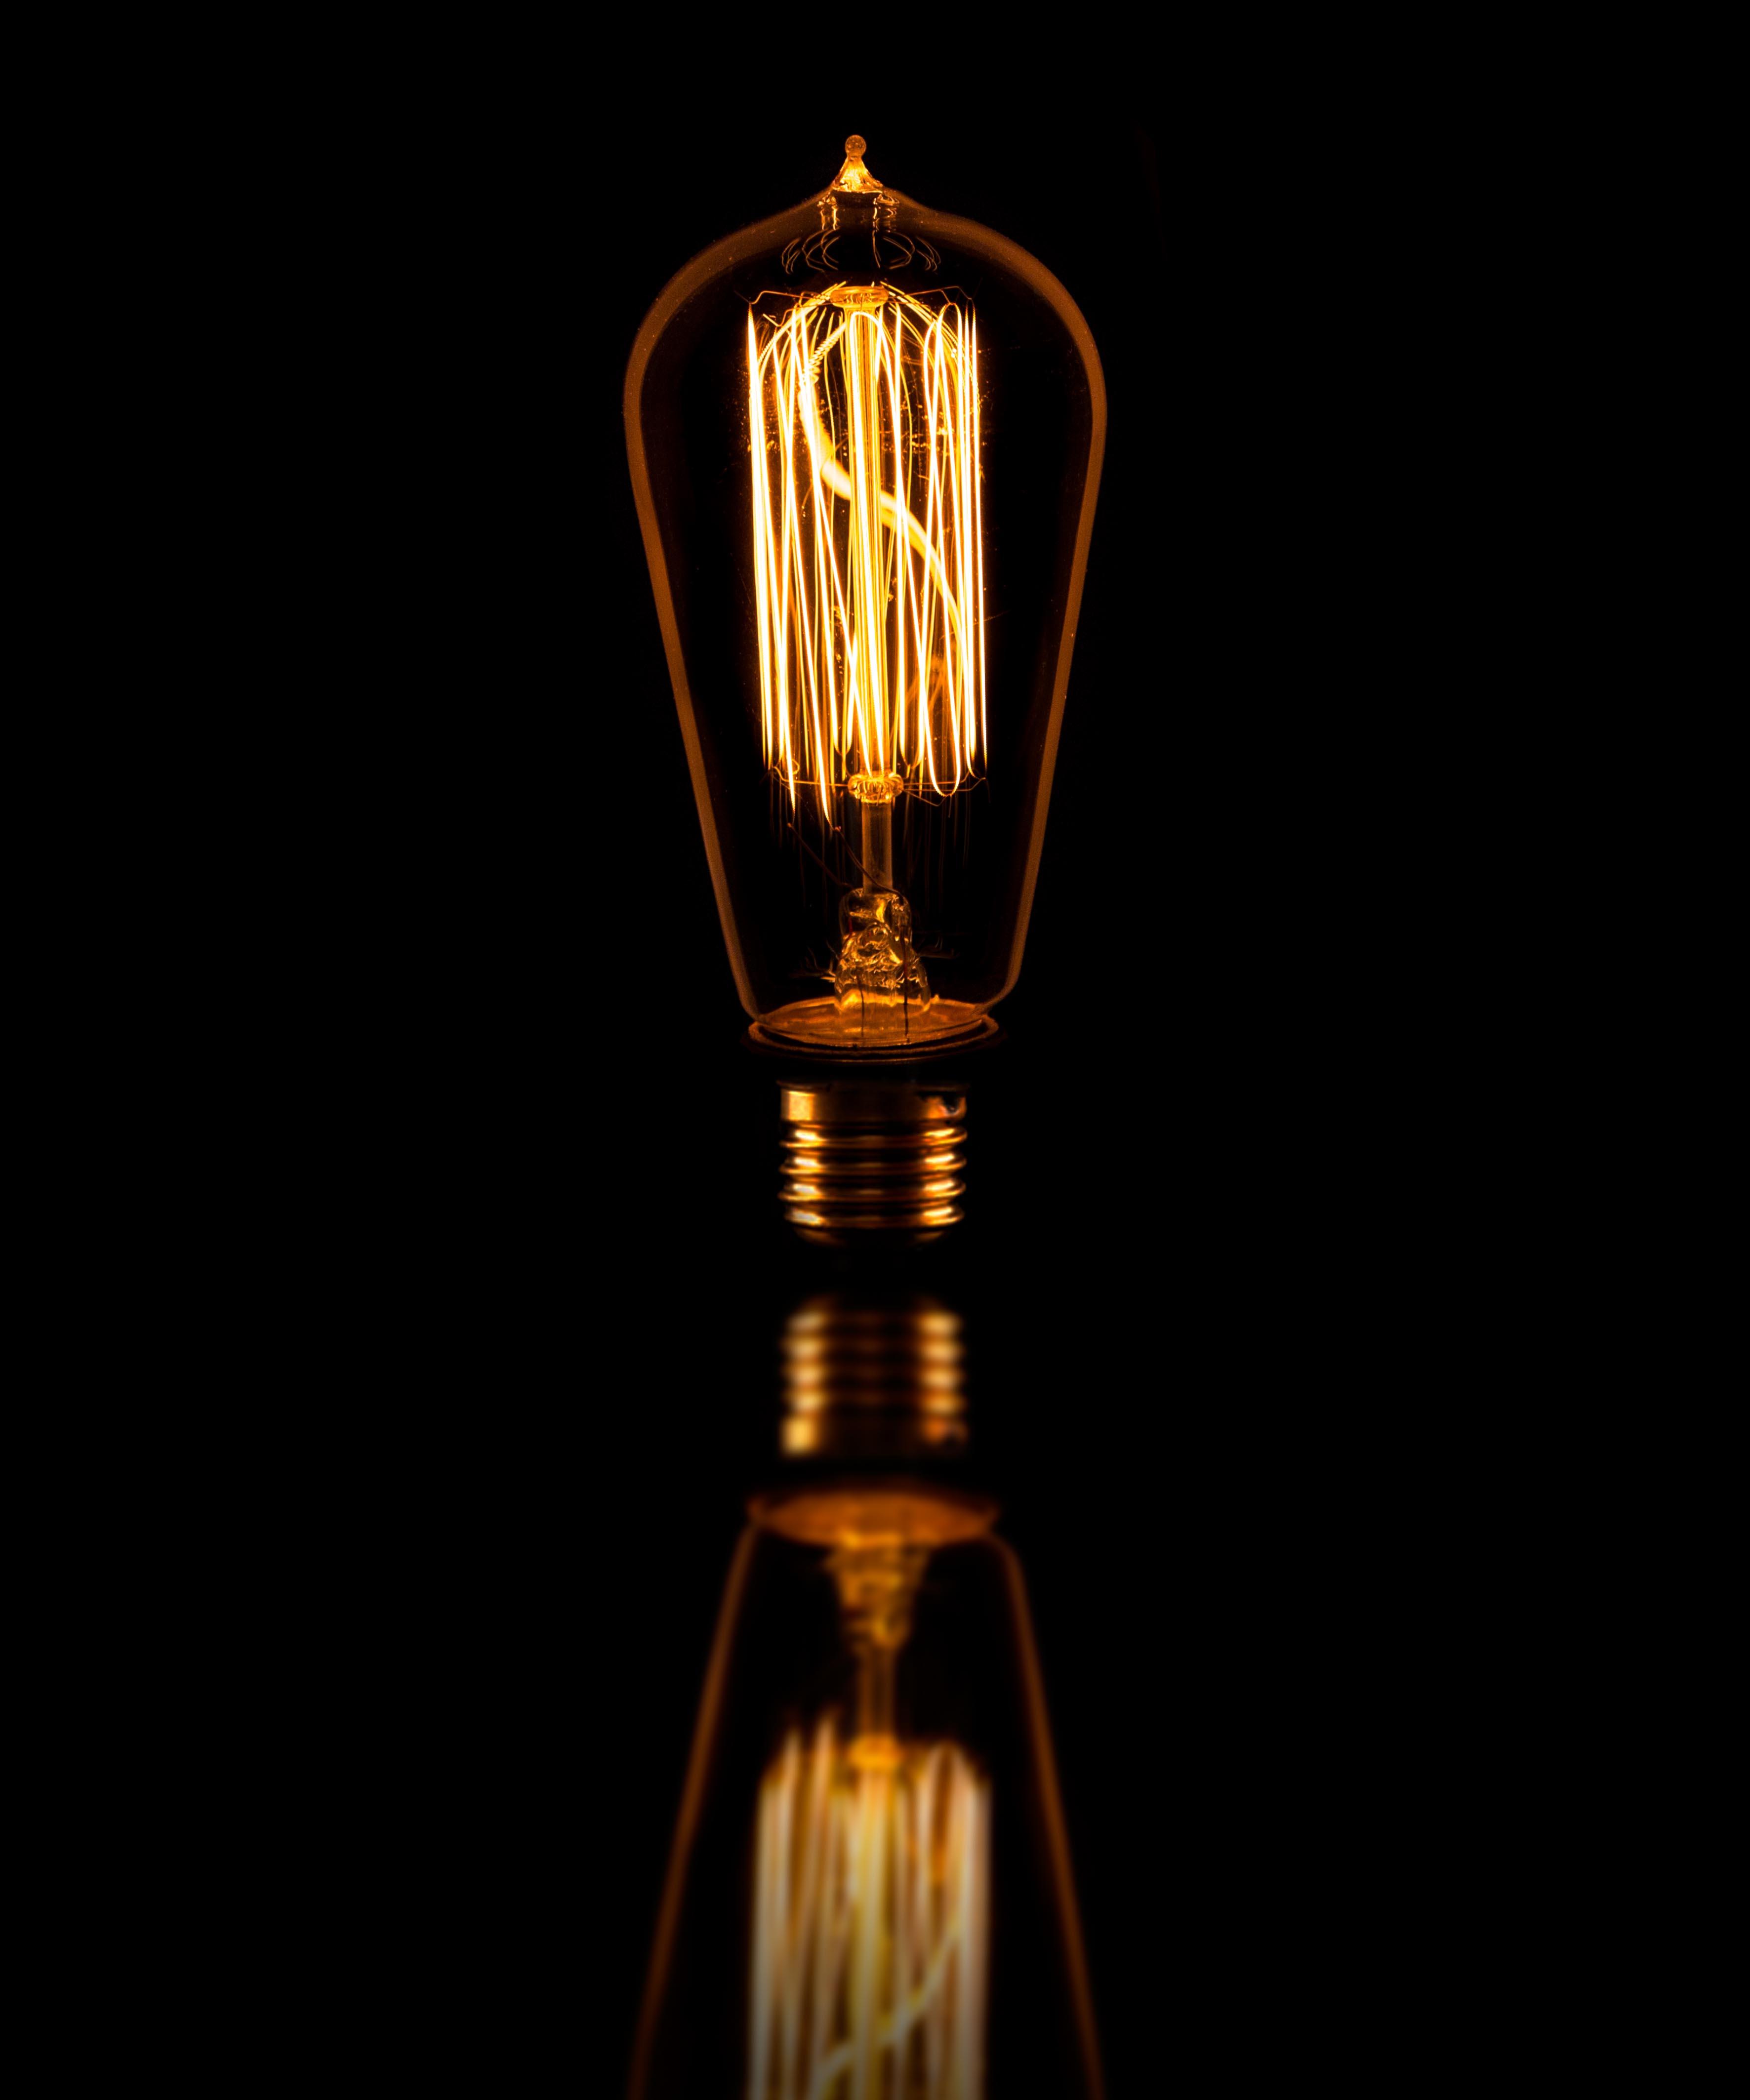 Teardrop st64 william and watson vintage edison bulb industrial light - Teardrop Medium William And Watson Industrial Vintage Retro Edison Light Bulb White Copy Black Teardrop Cropped